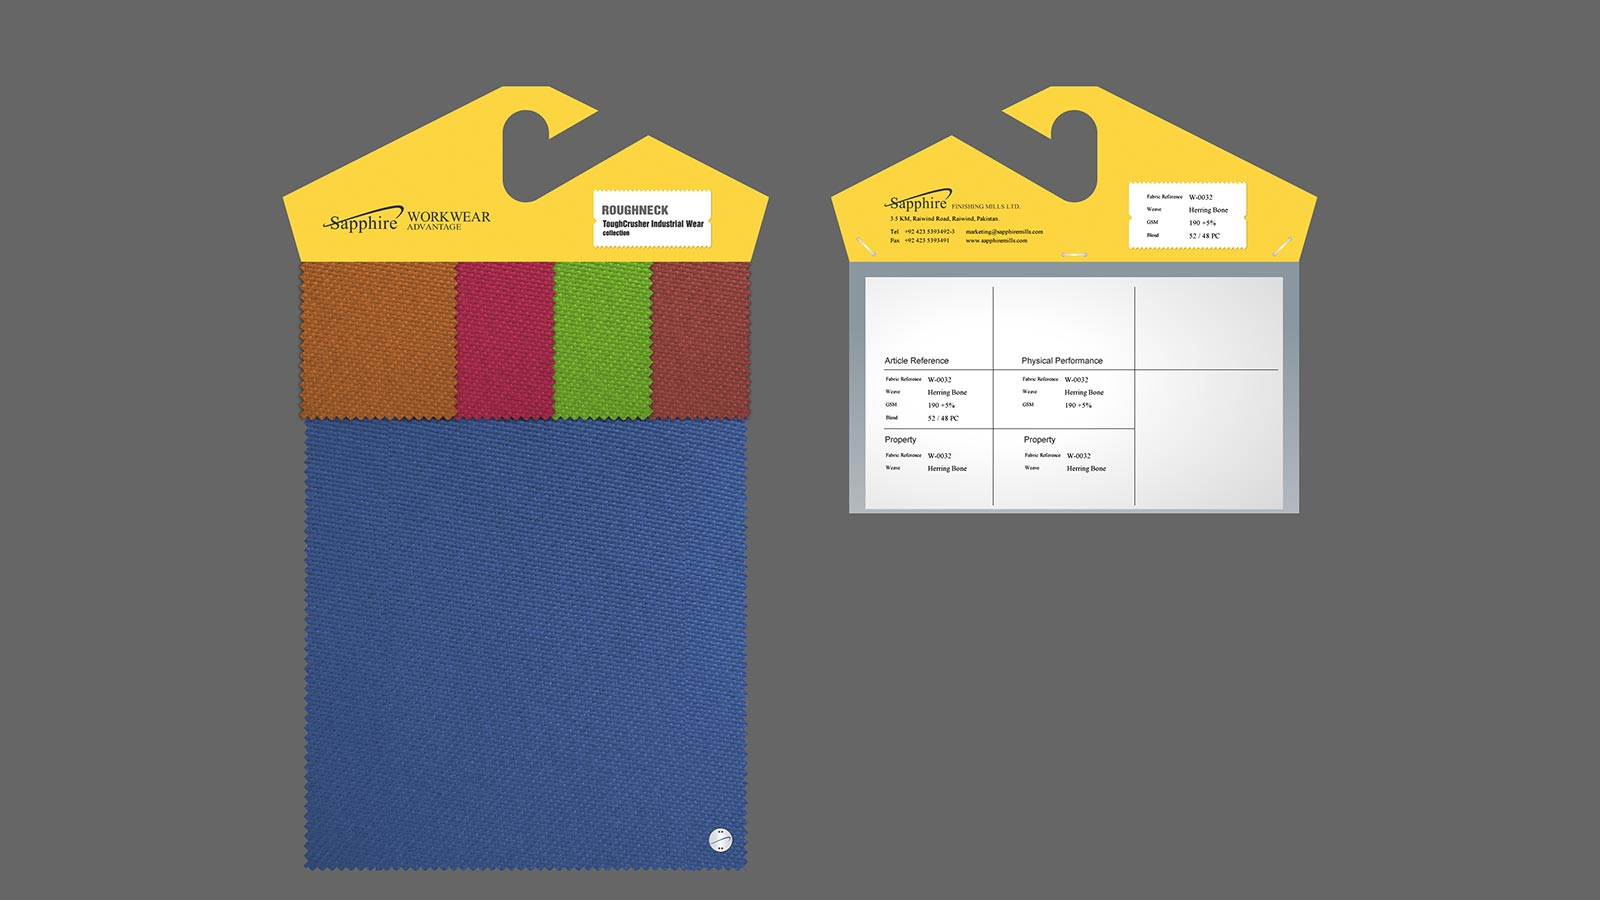 sapphire-textiles-graphic-brand-design-web-designer-hiline-lahore-pakistan-010